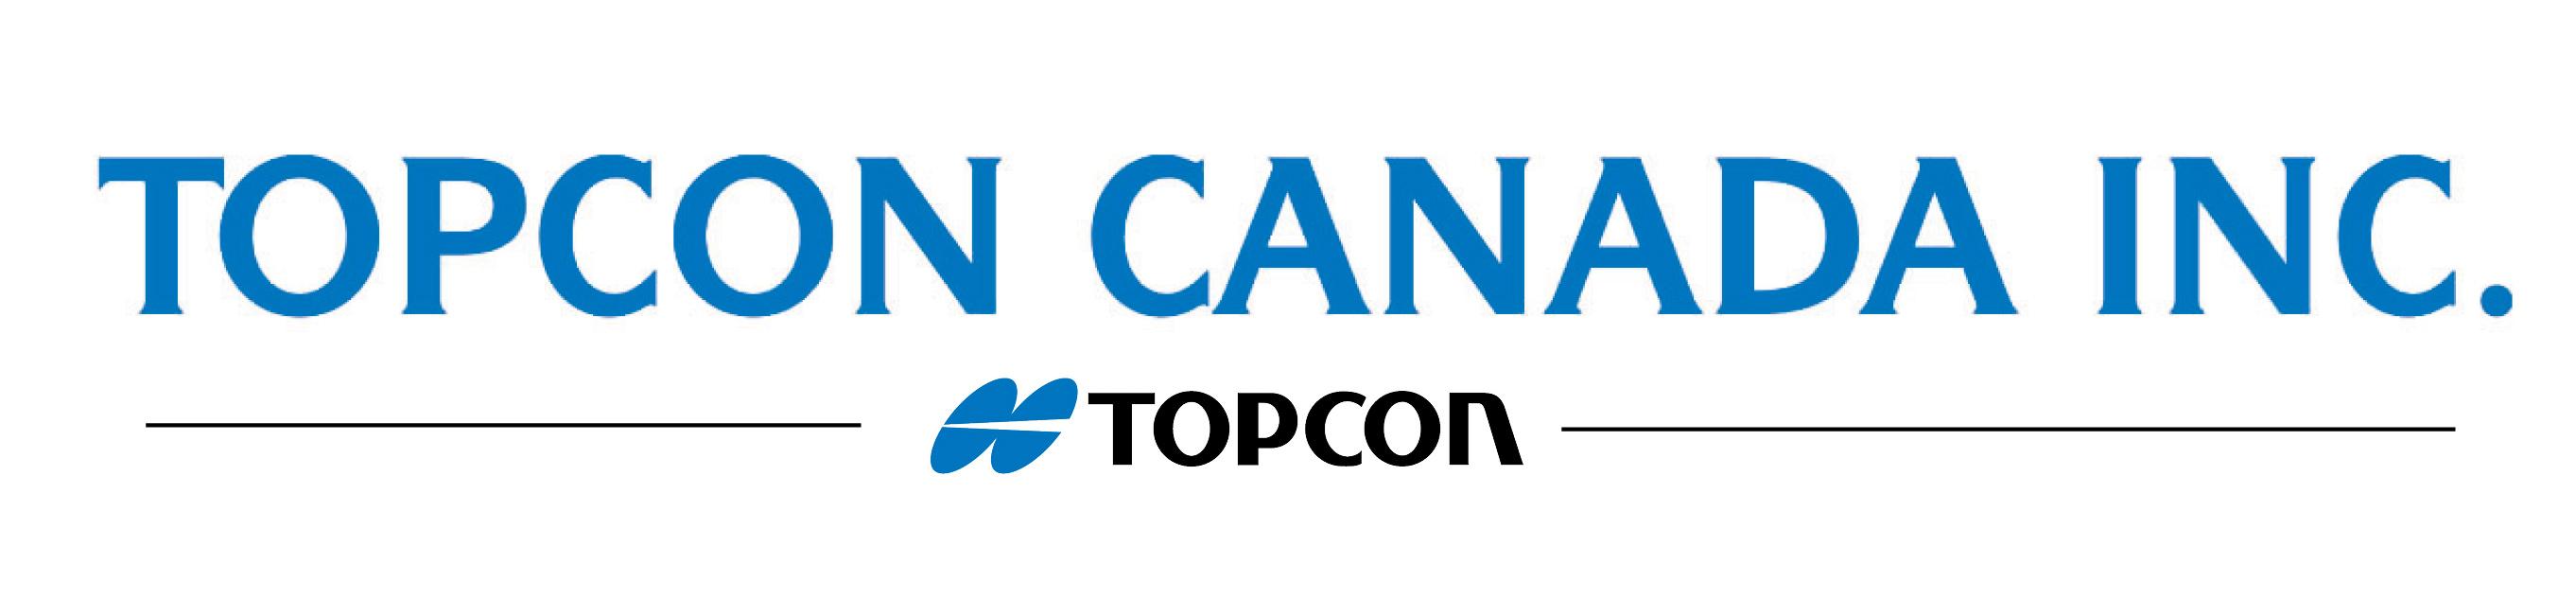 Topcon Canada Inc